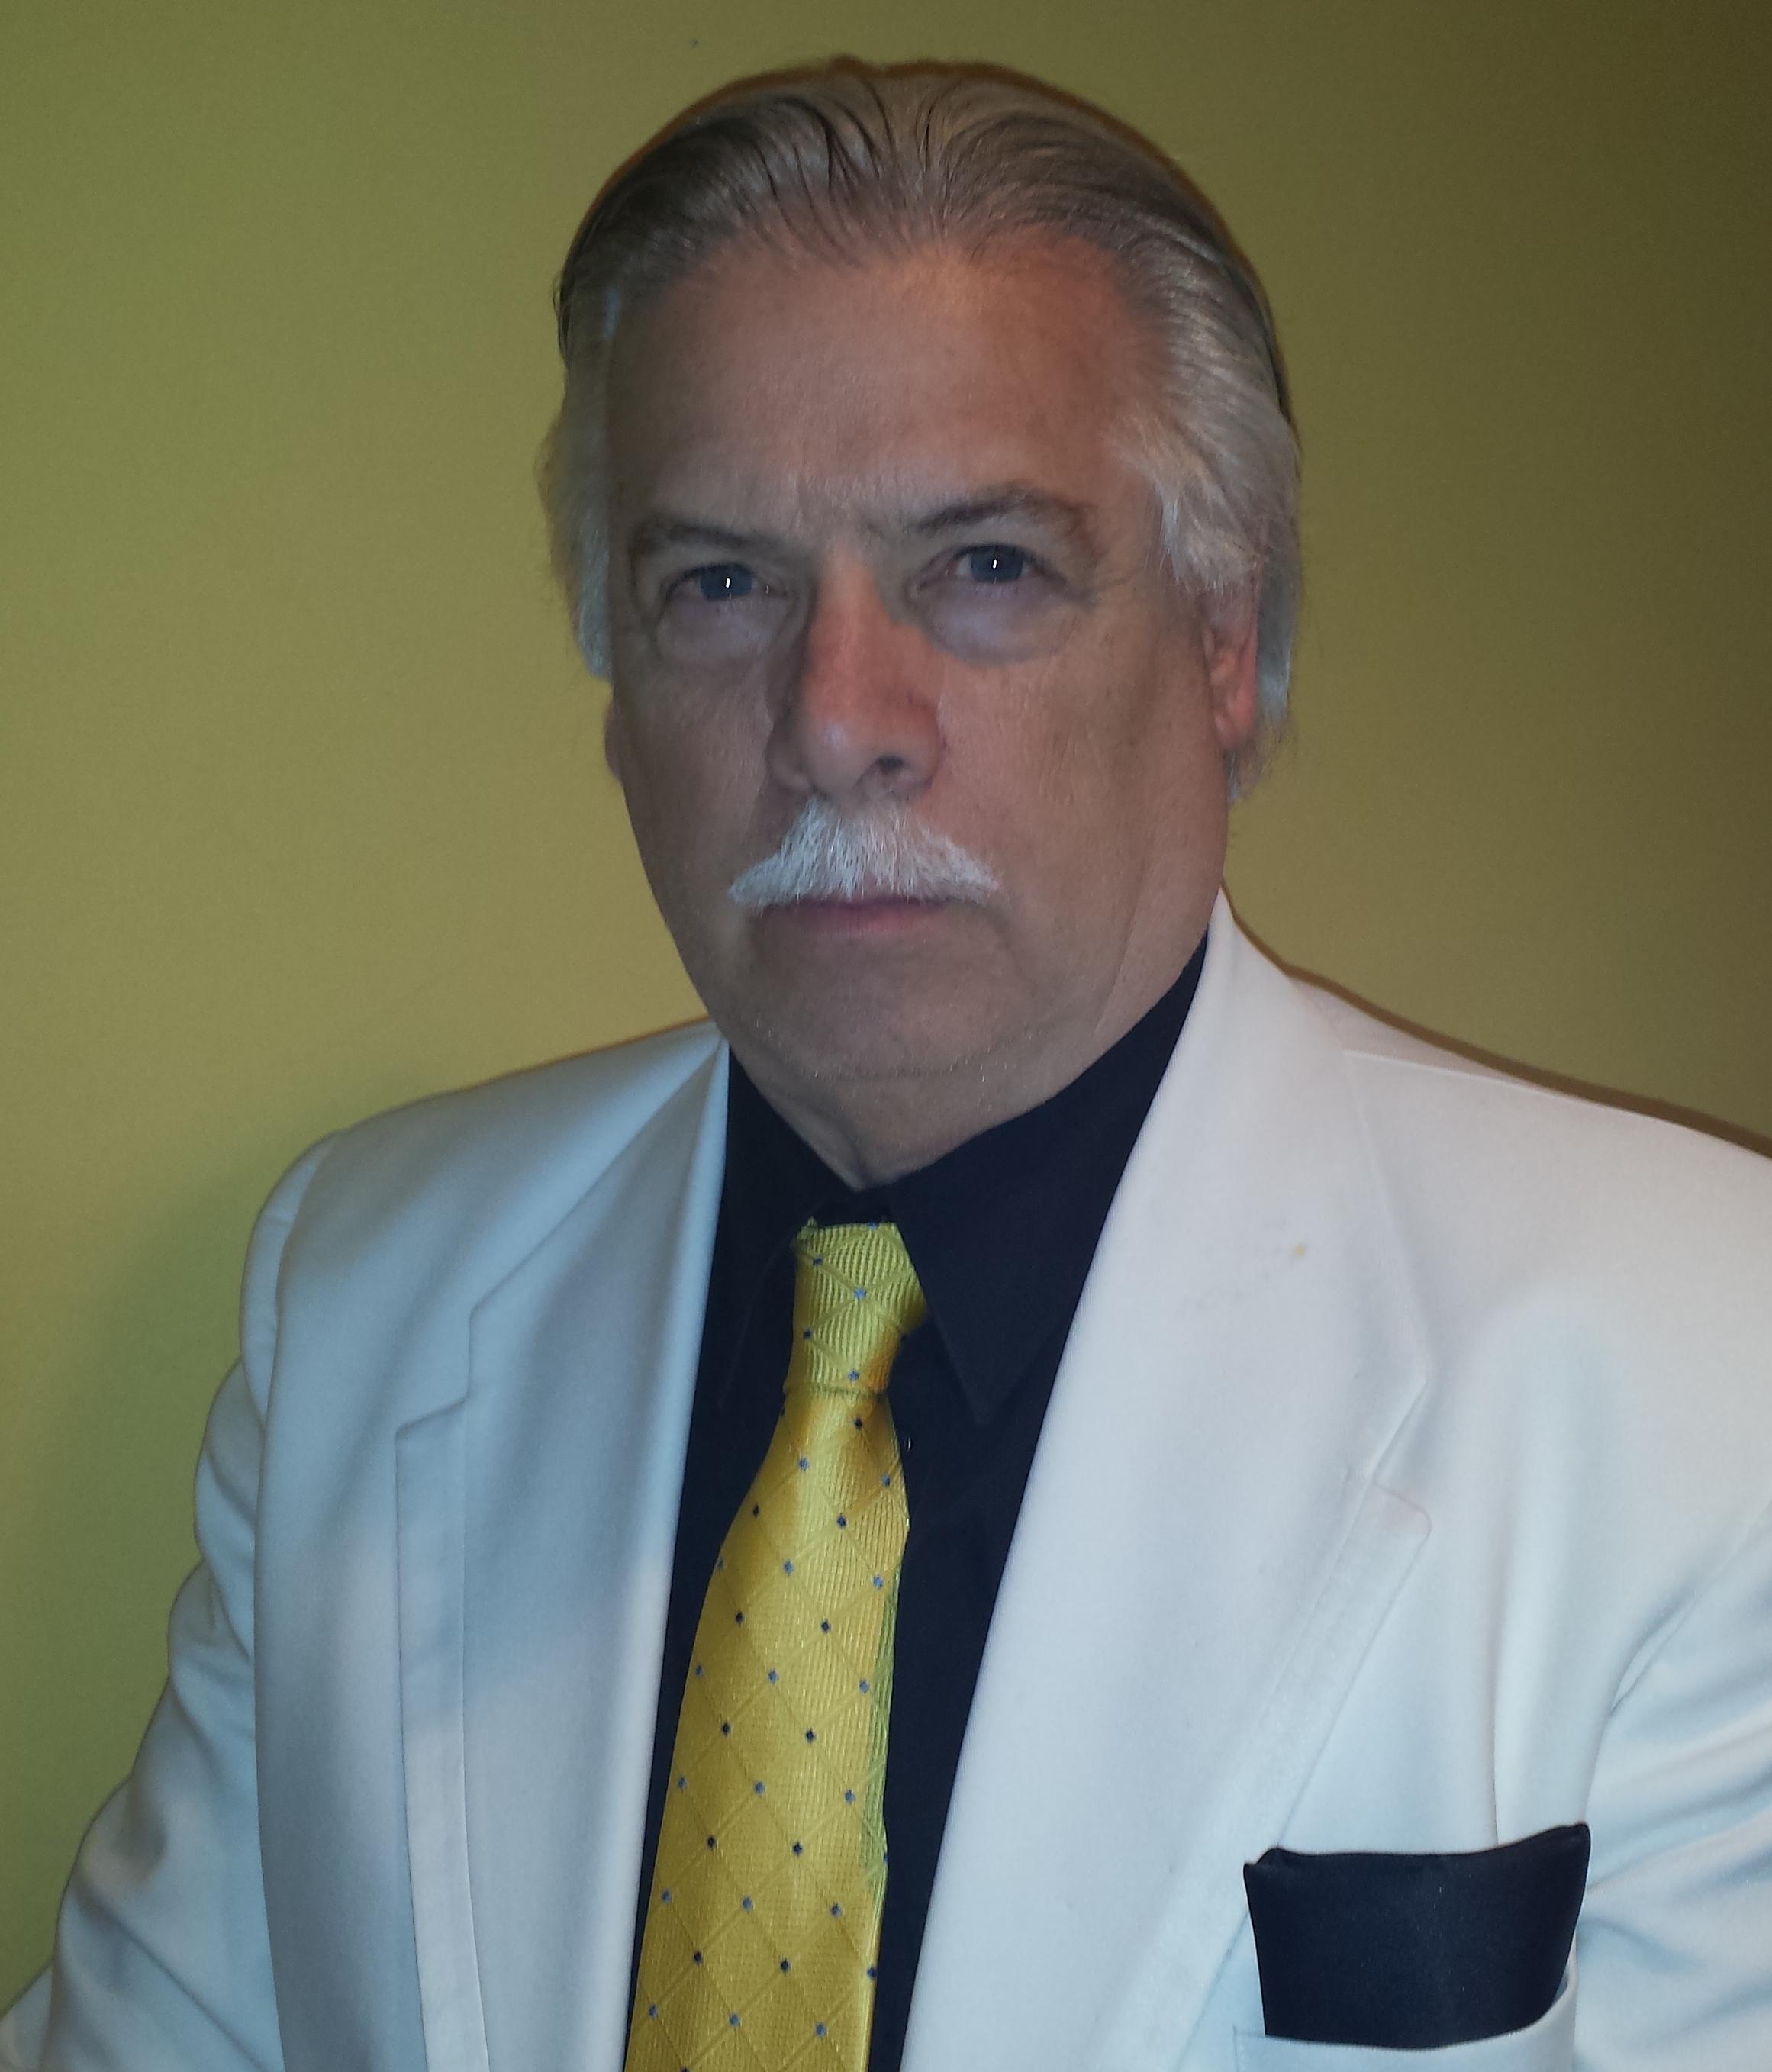 Don Franco played by Dan DiVirgilio